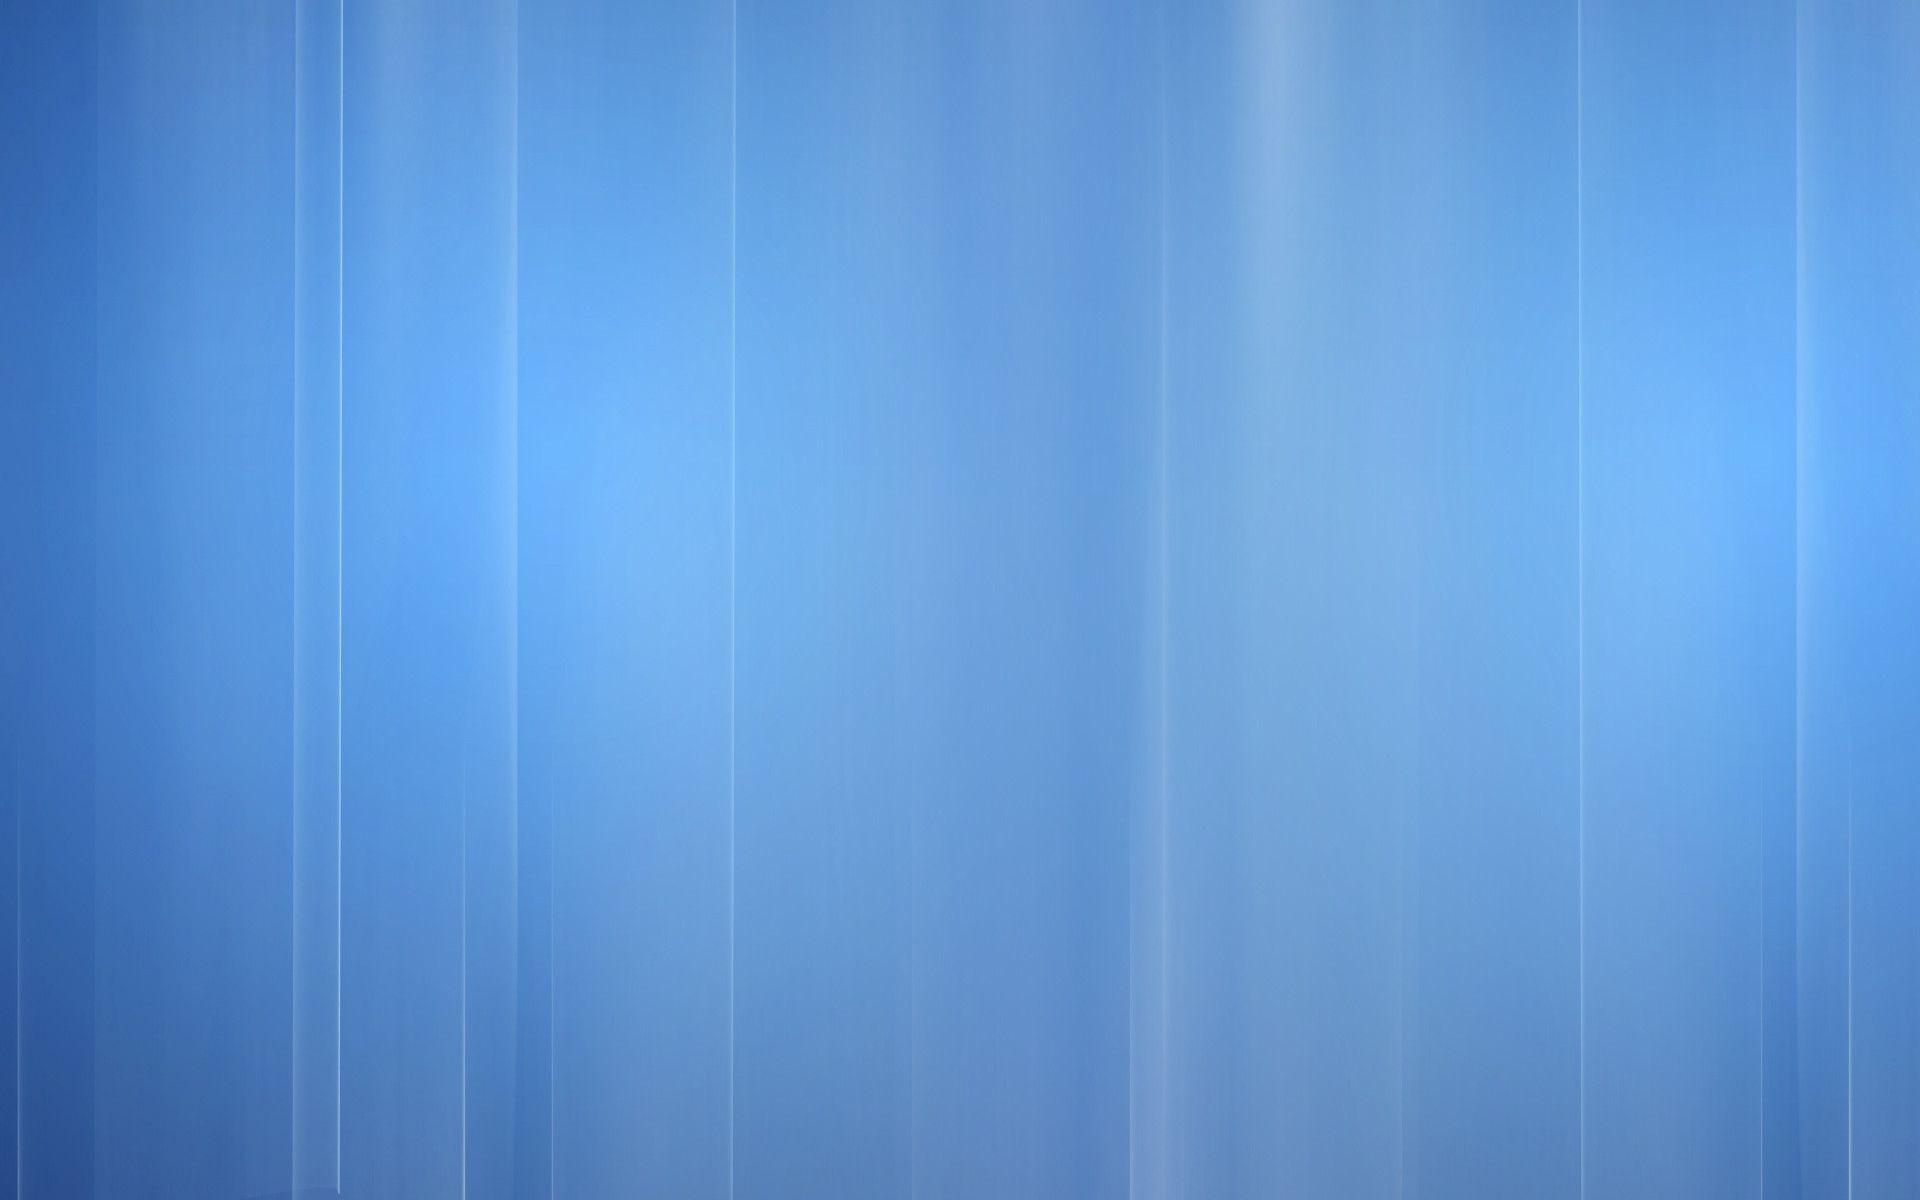 Plain Blue Backgrounds Wallpapers – Wallpaper Cave